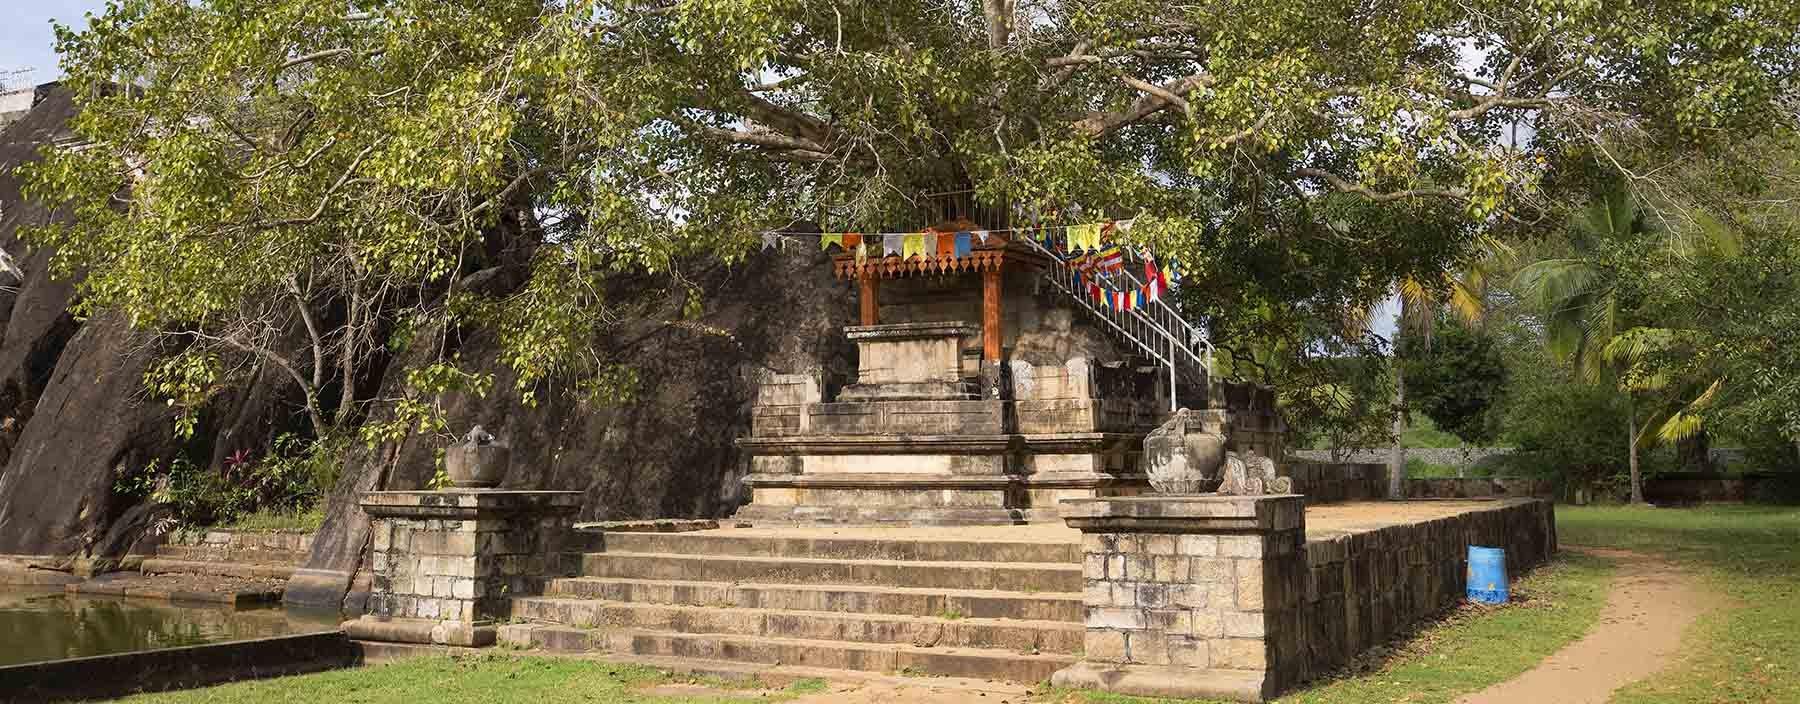 sri lanka, anuradhapura, bodhi tree.jpg